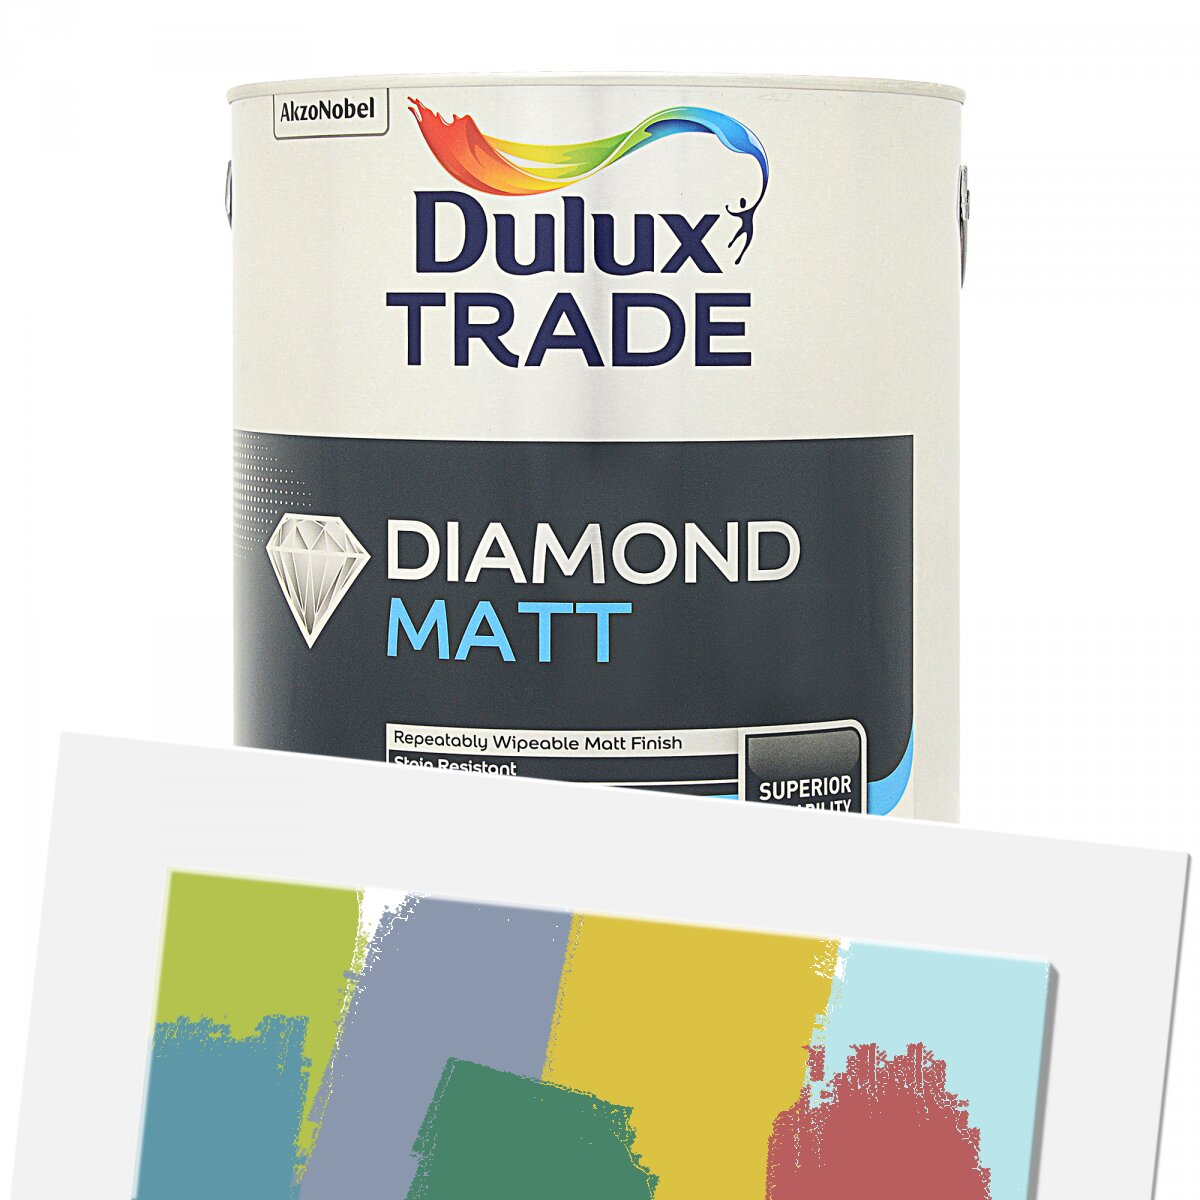 Dulux Trade Diamond Matt (Tinted) Natural Taupe 3 5L